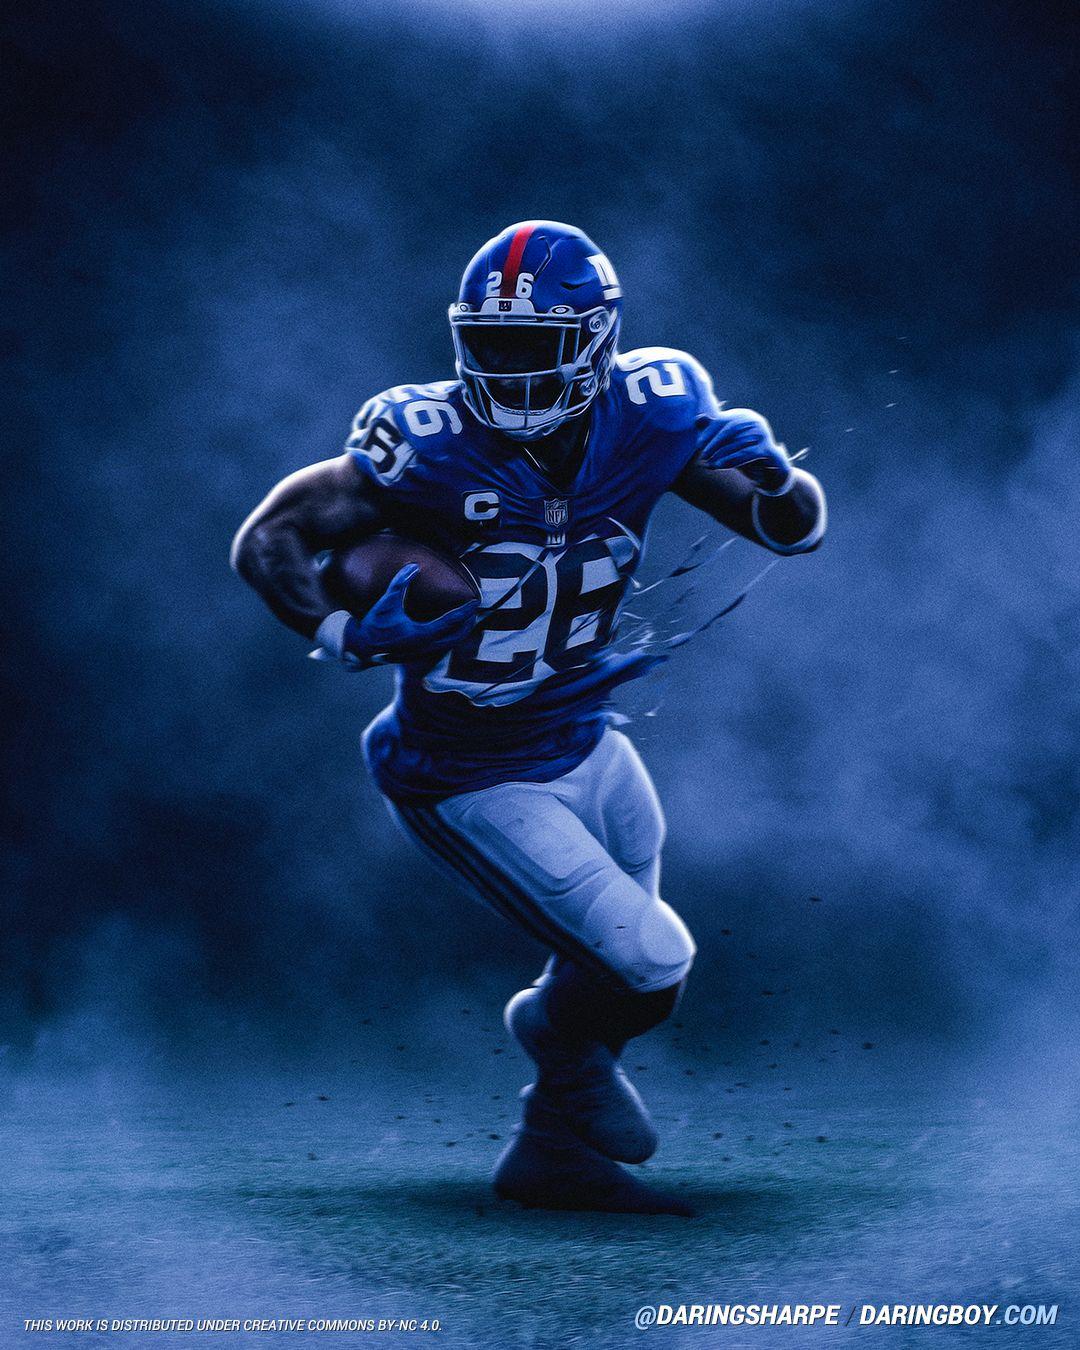 Saquon Barkley New York Giants Penn State Nittany Lions Ny Giants Football Nfl Football Art Nfl Football Pictures